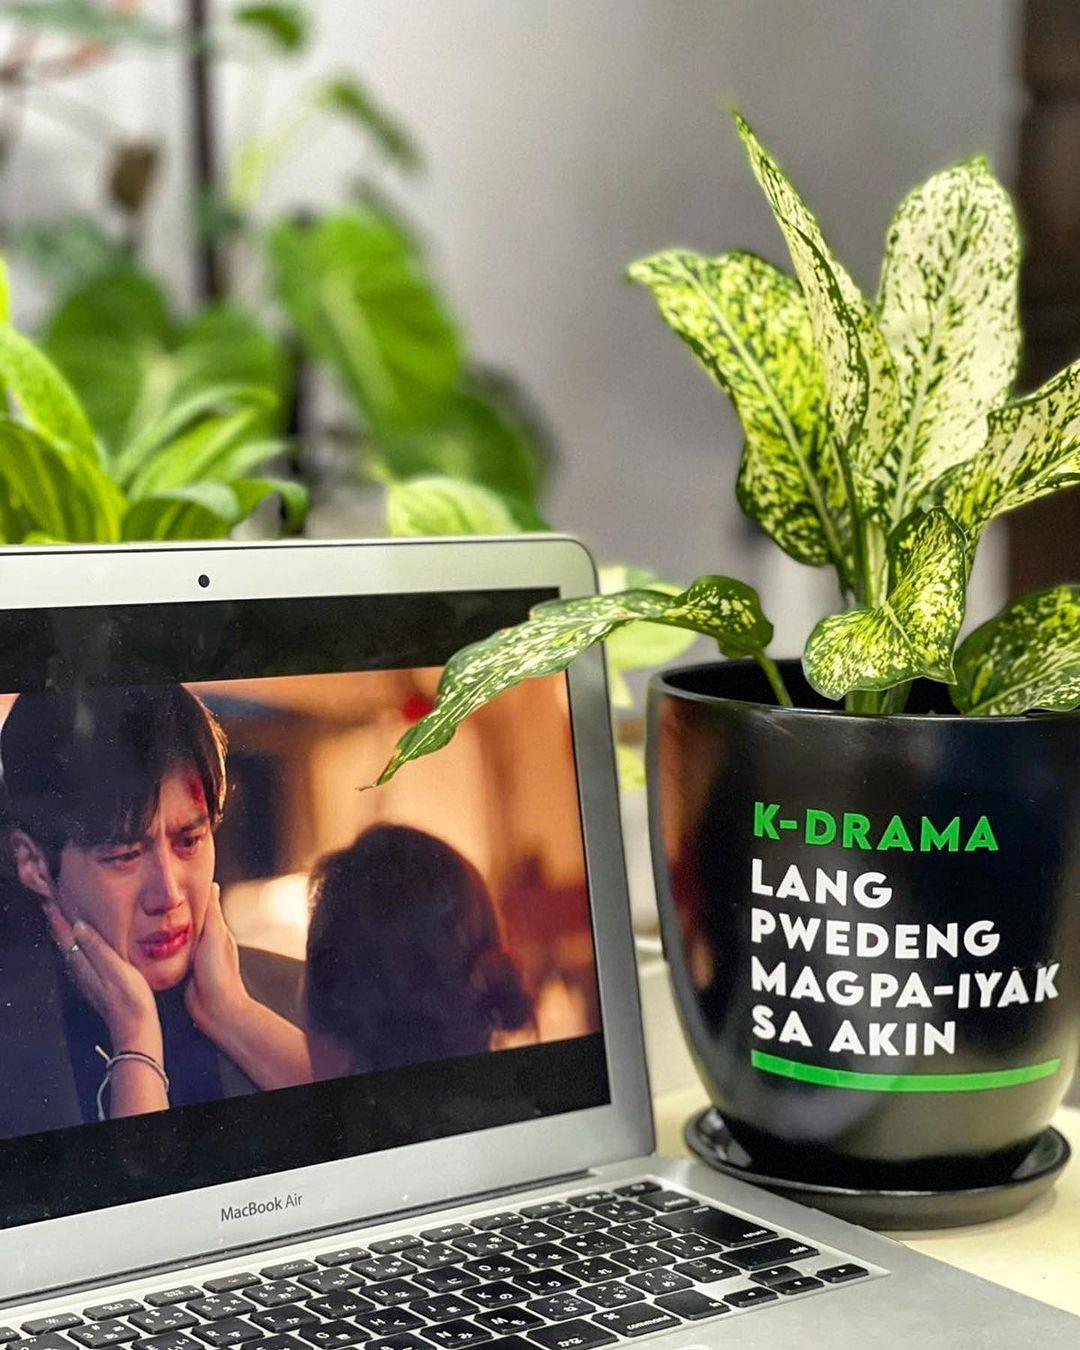 K-drama inspired pots